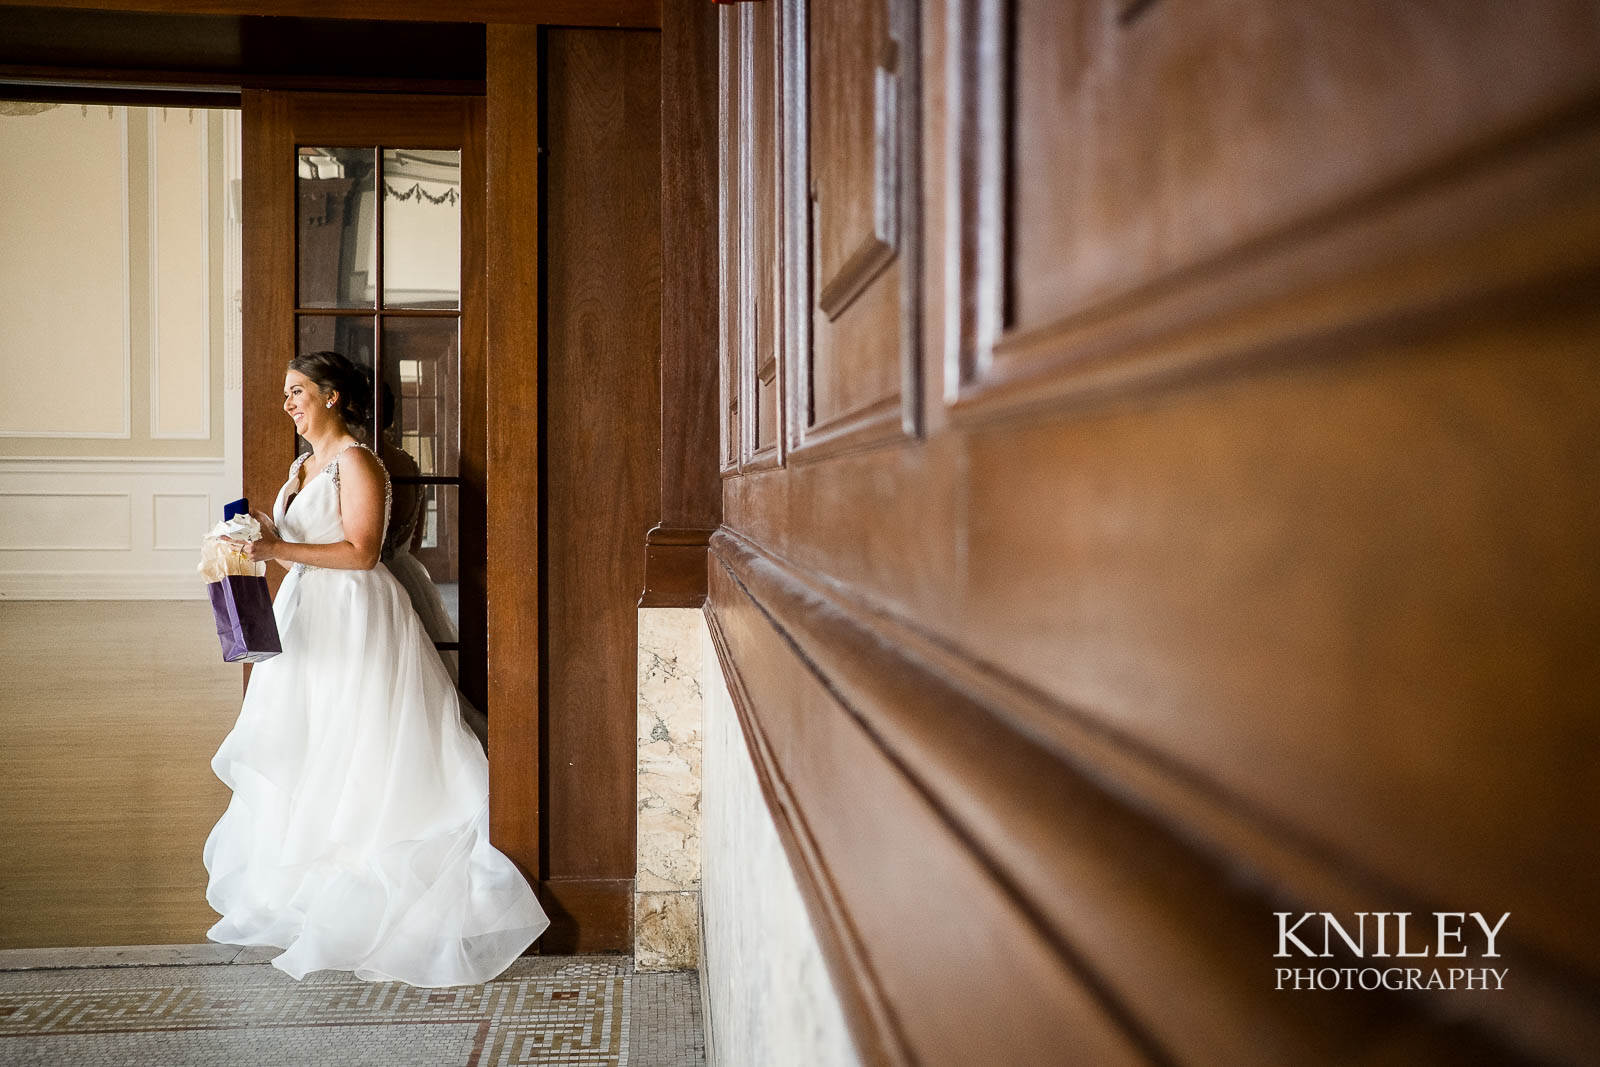 17-Hotel-at-the-Lafayette-wedding-getting-ready-Buffalo-NY-Wedding-Photography.jpg